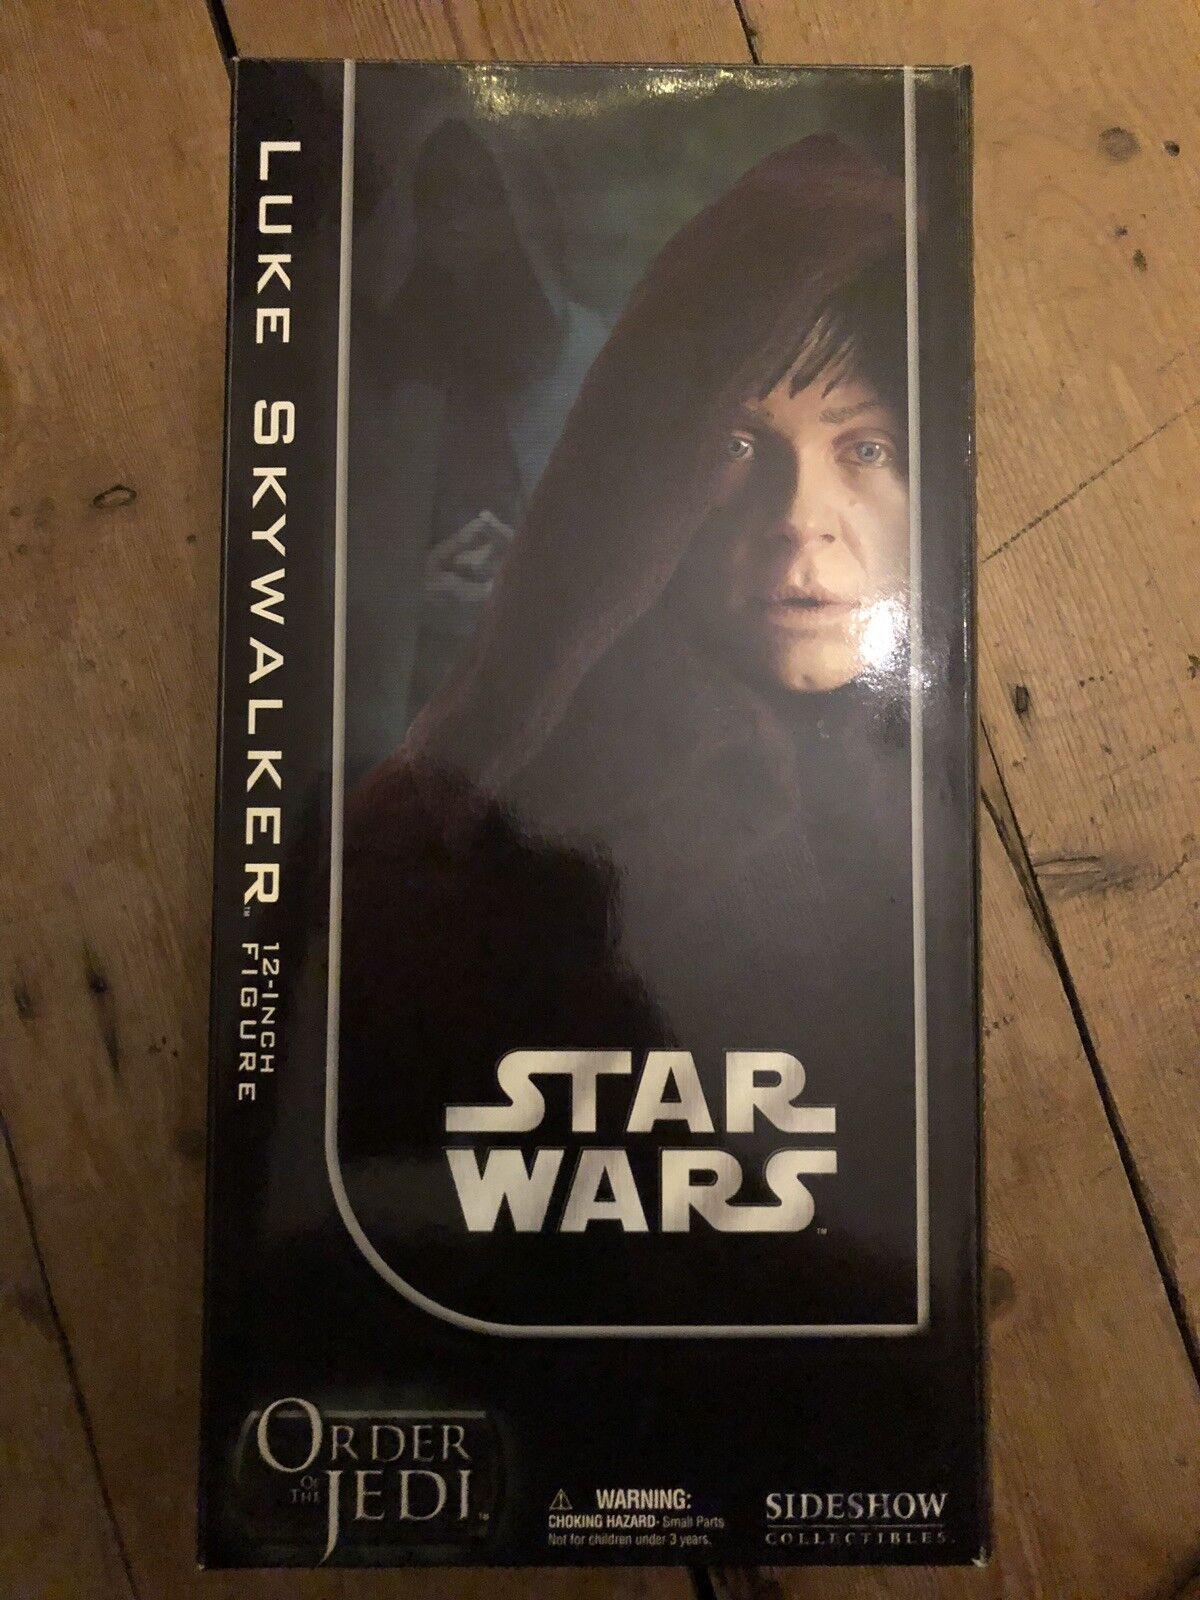 Sideshow Star Wars  Order of the Jedi Luke Skywalker Jedi Knight afssc 1082  meilleure qualité meilleur prix